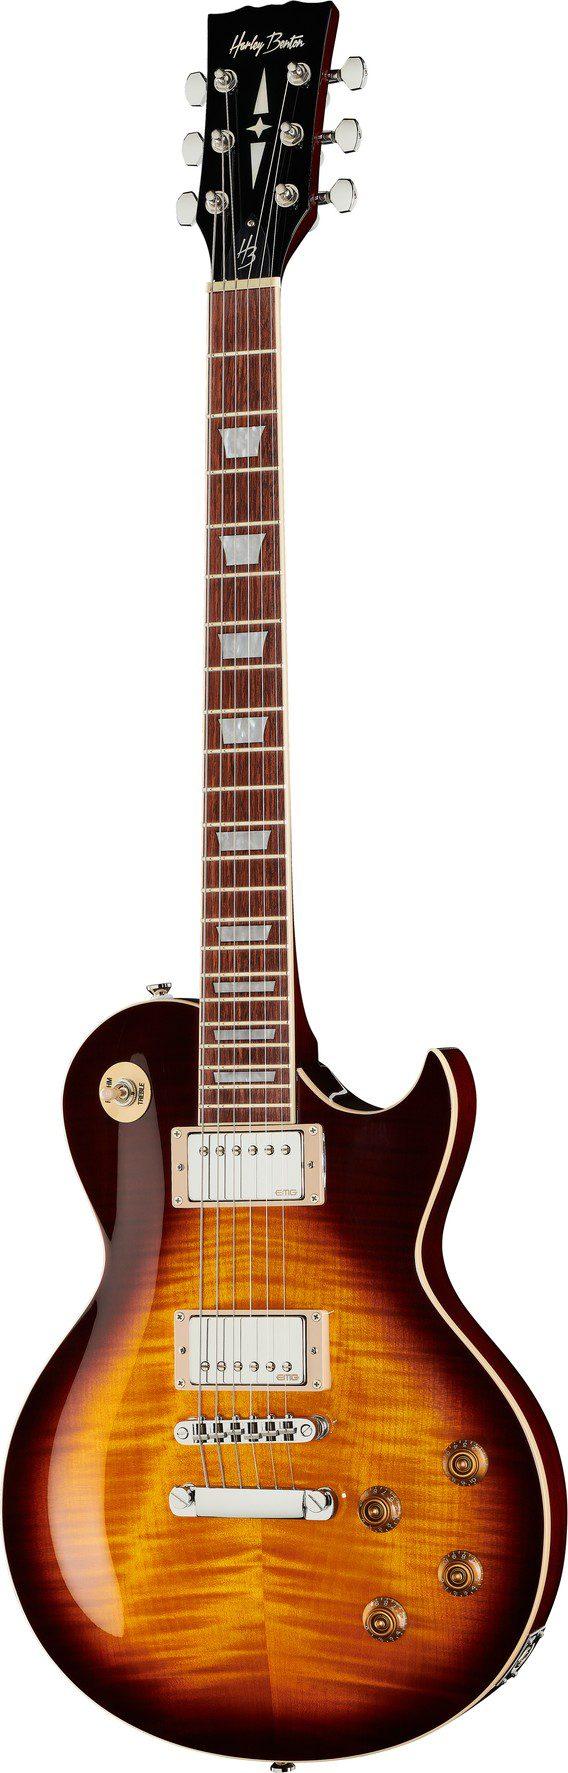 Harley Benton SC-550 Plus 2